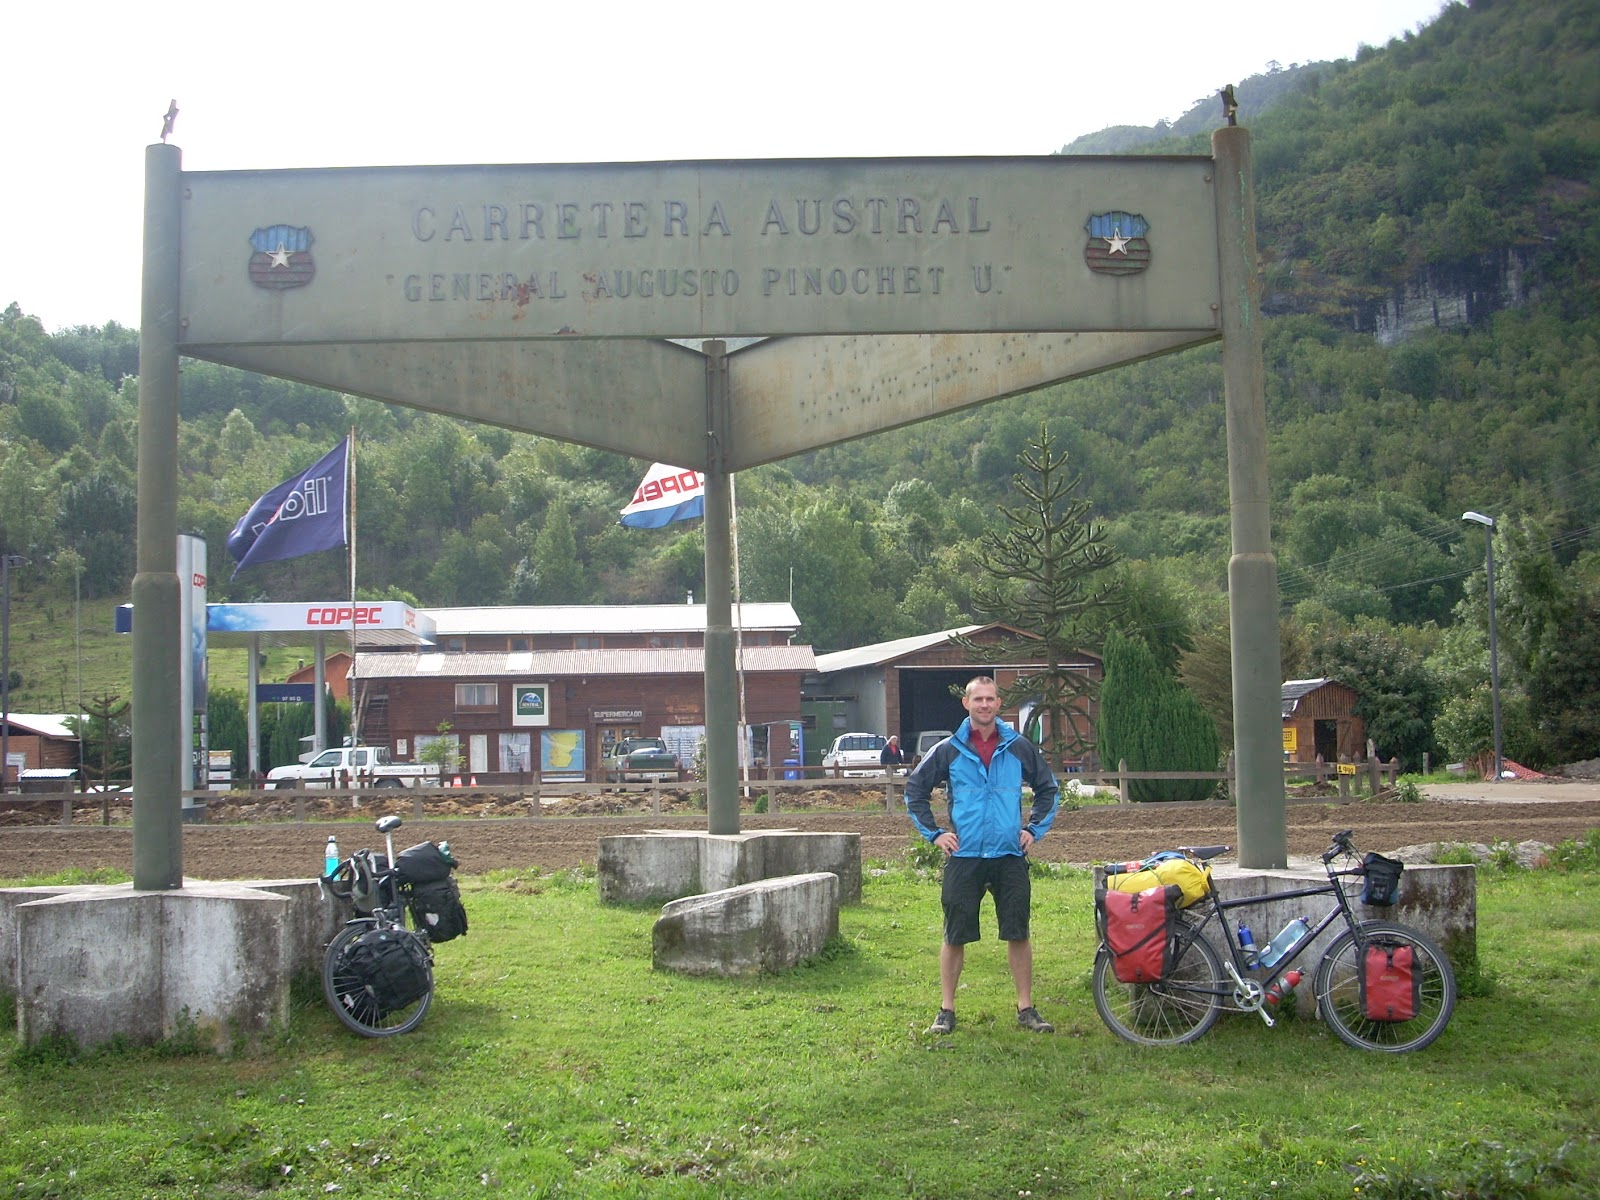 The Carretera Austral